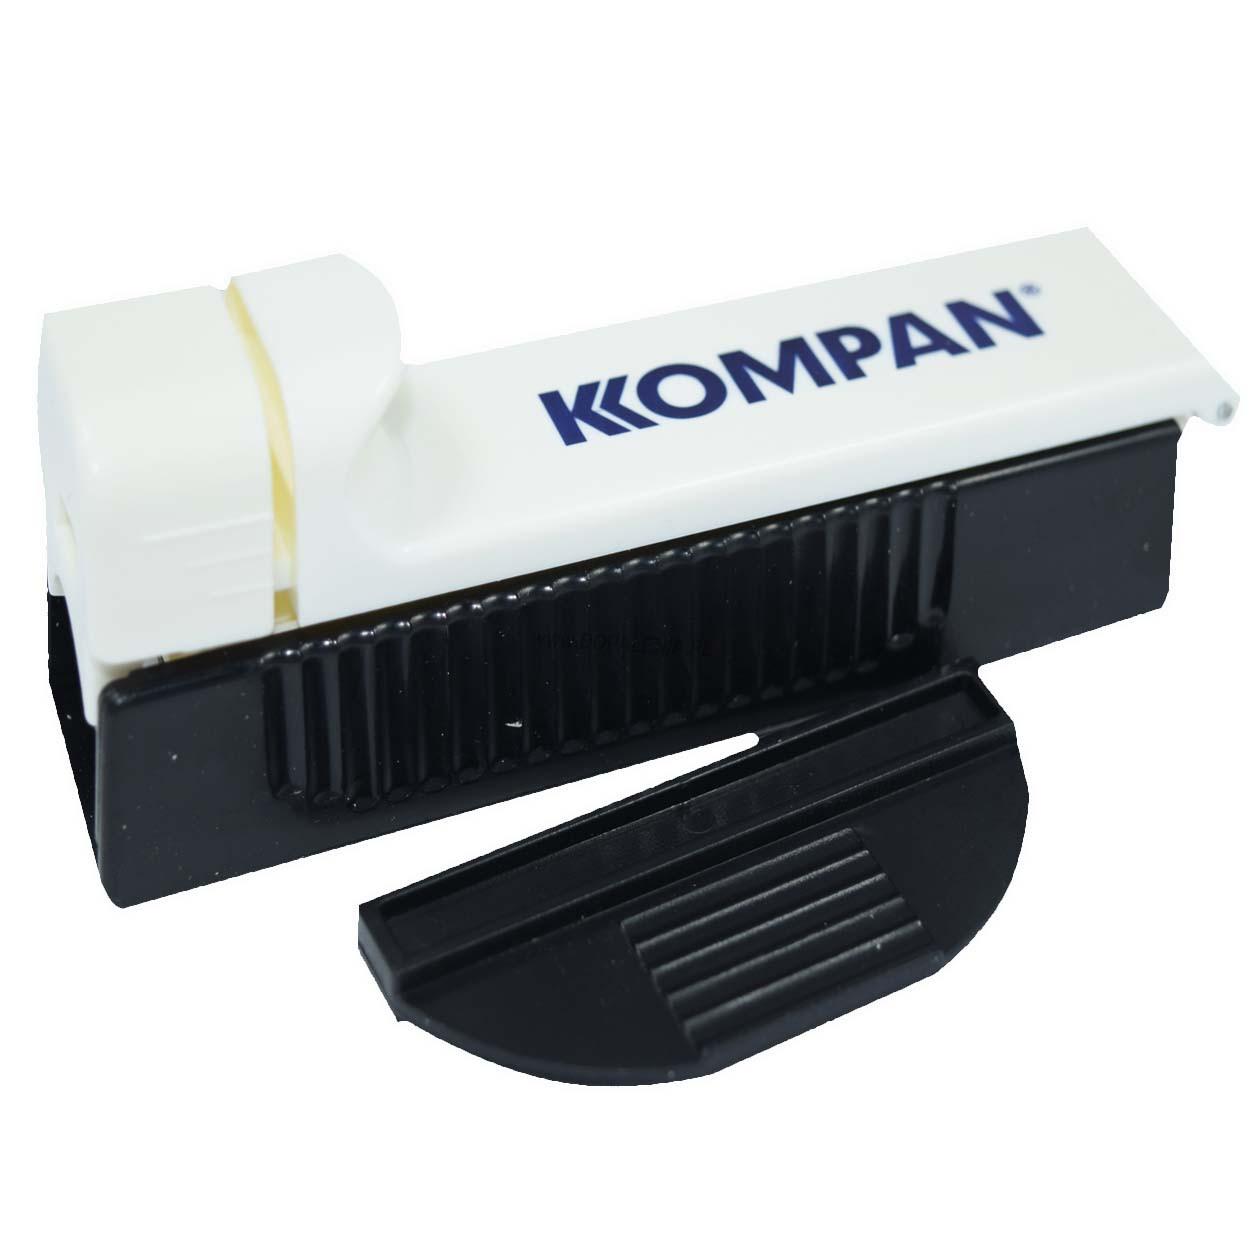 Машинка Для Набивки Сигарет Kompan